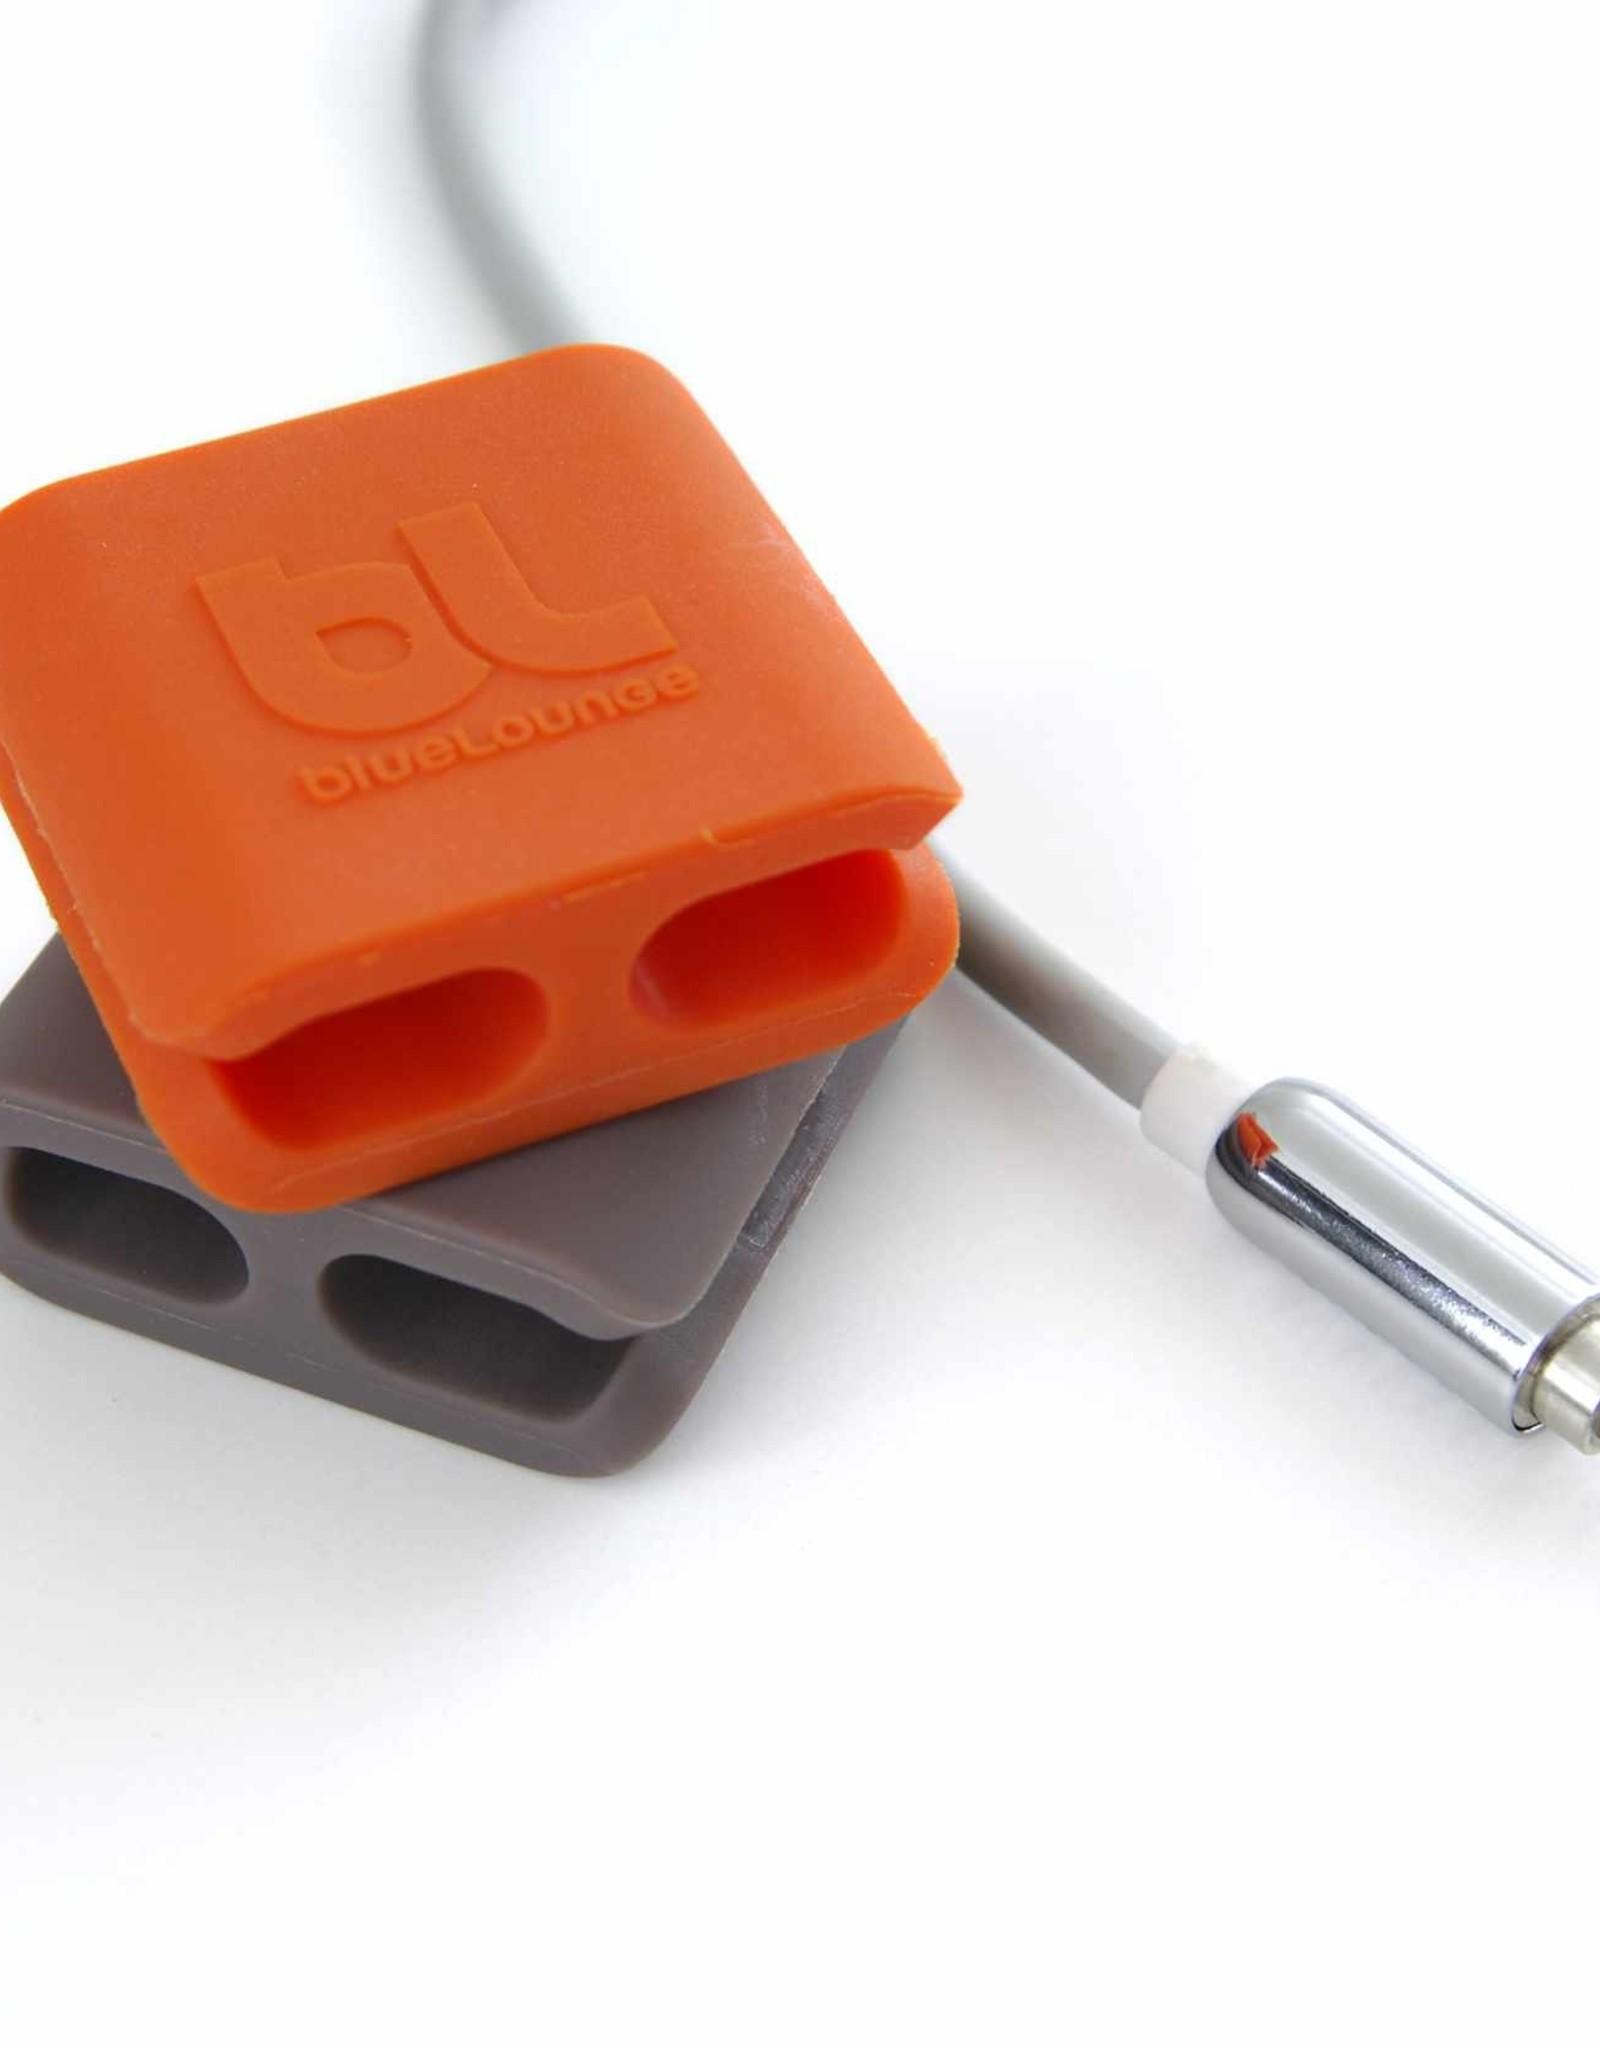 Bluelounge - CableClip Medium Orange/Grey 111-1019